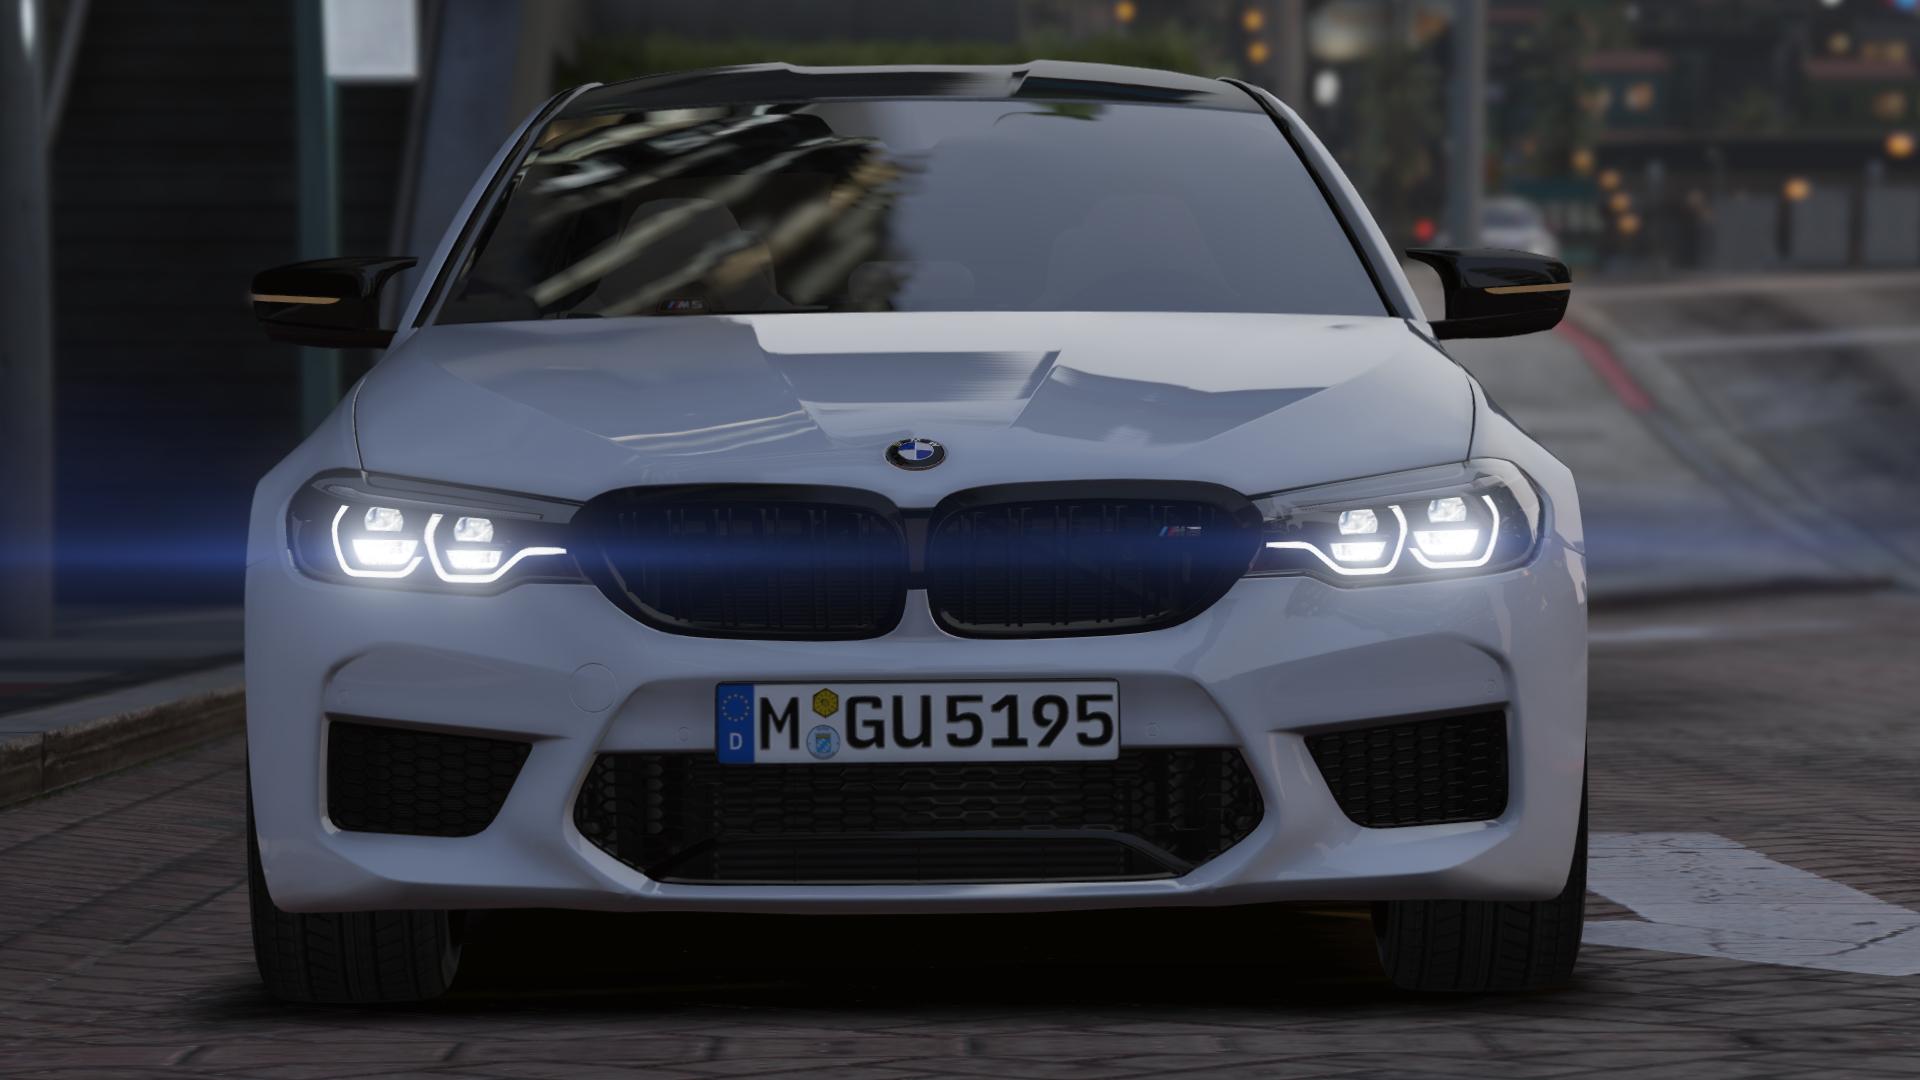 2019 Bmw M5 F90 Competition Add On Gta5 Mods Com